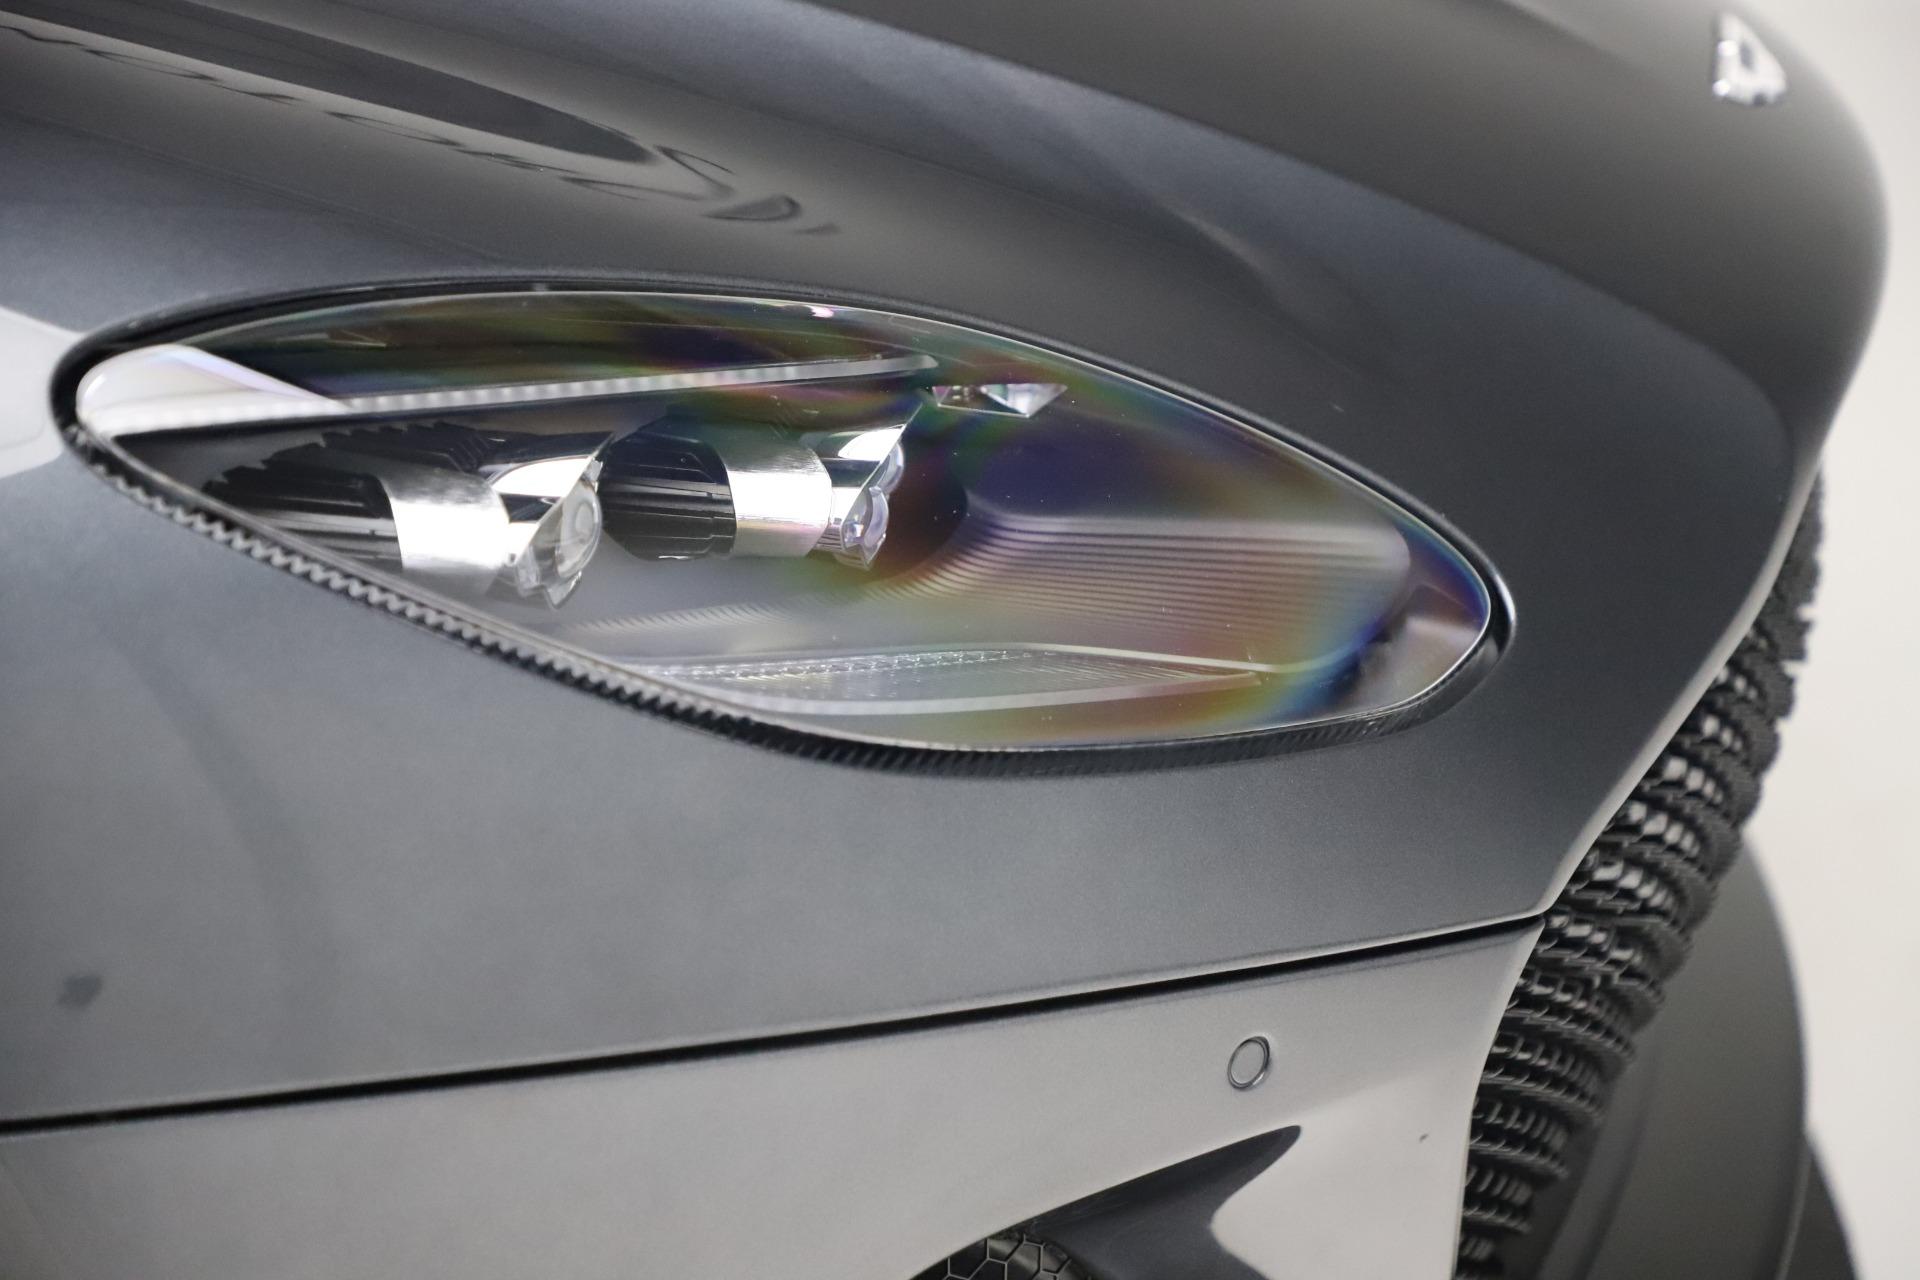 Used 2019 Aston Martin DBS Superleggera Coupe For Sale In Westport, CT 3570_p29